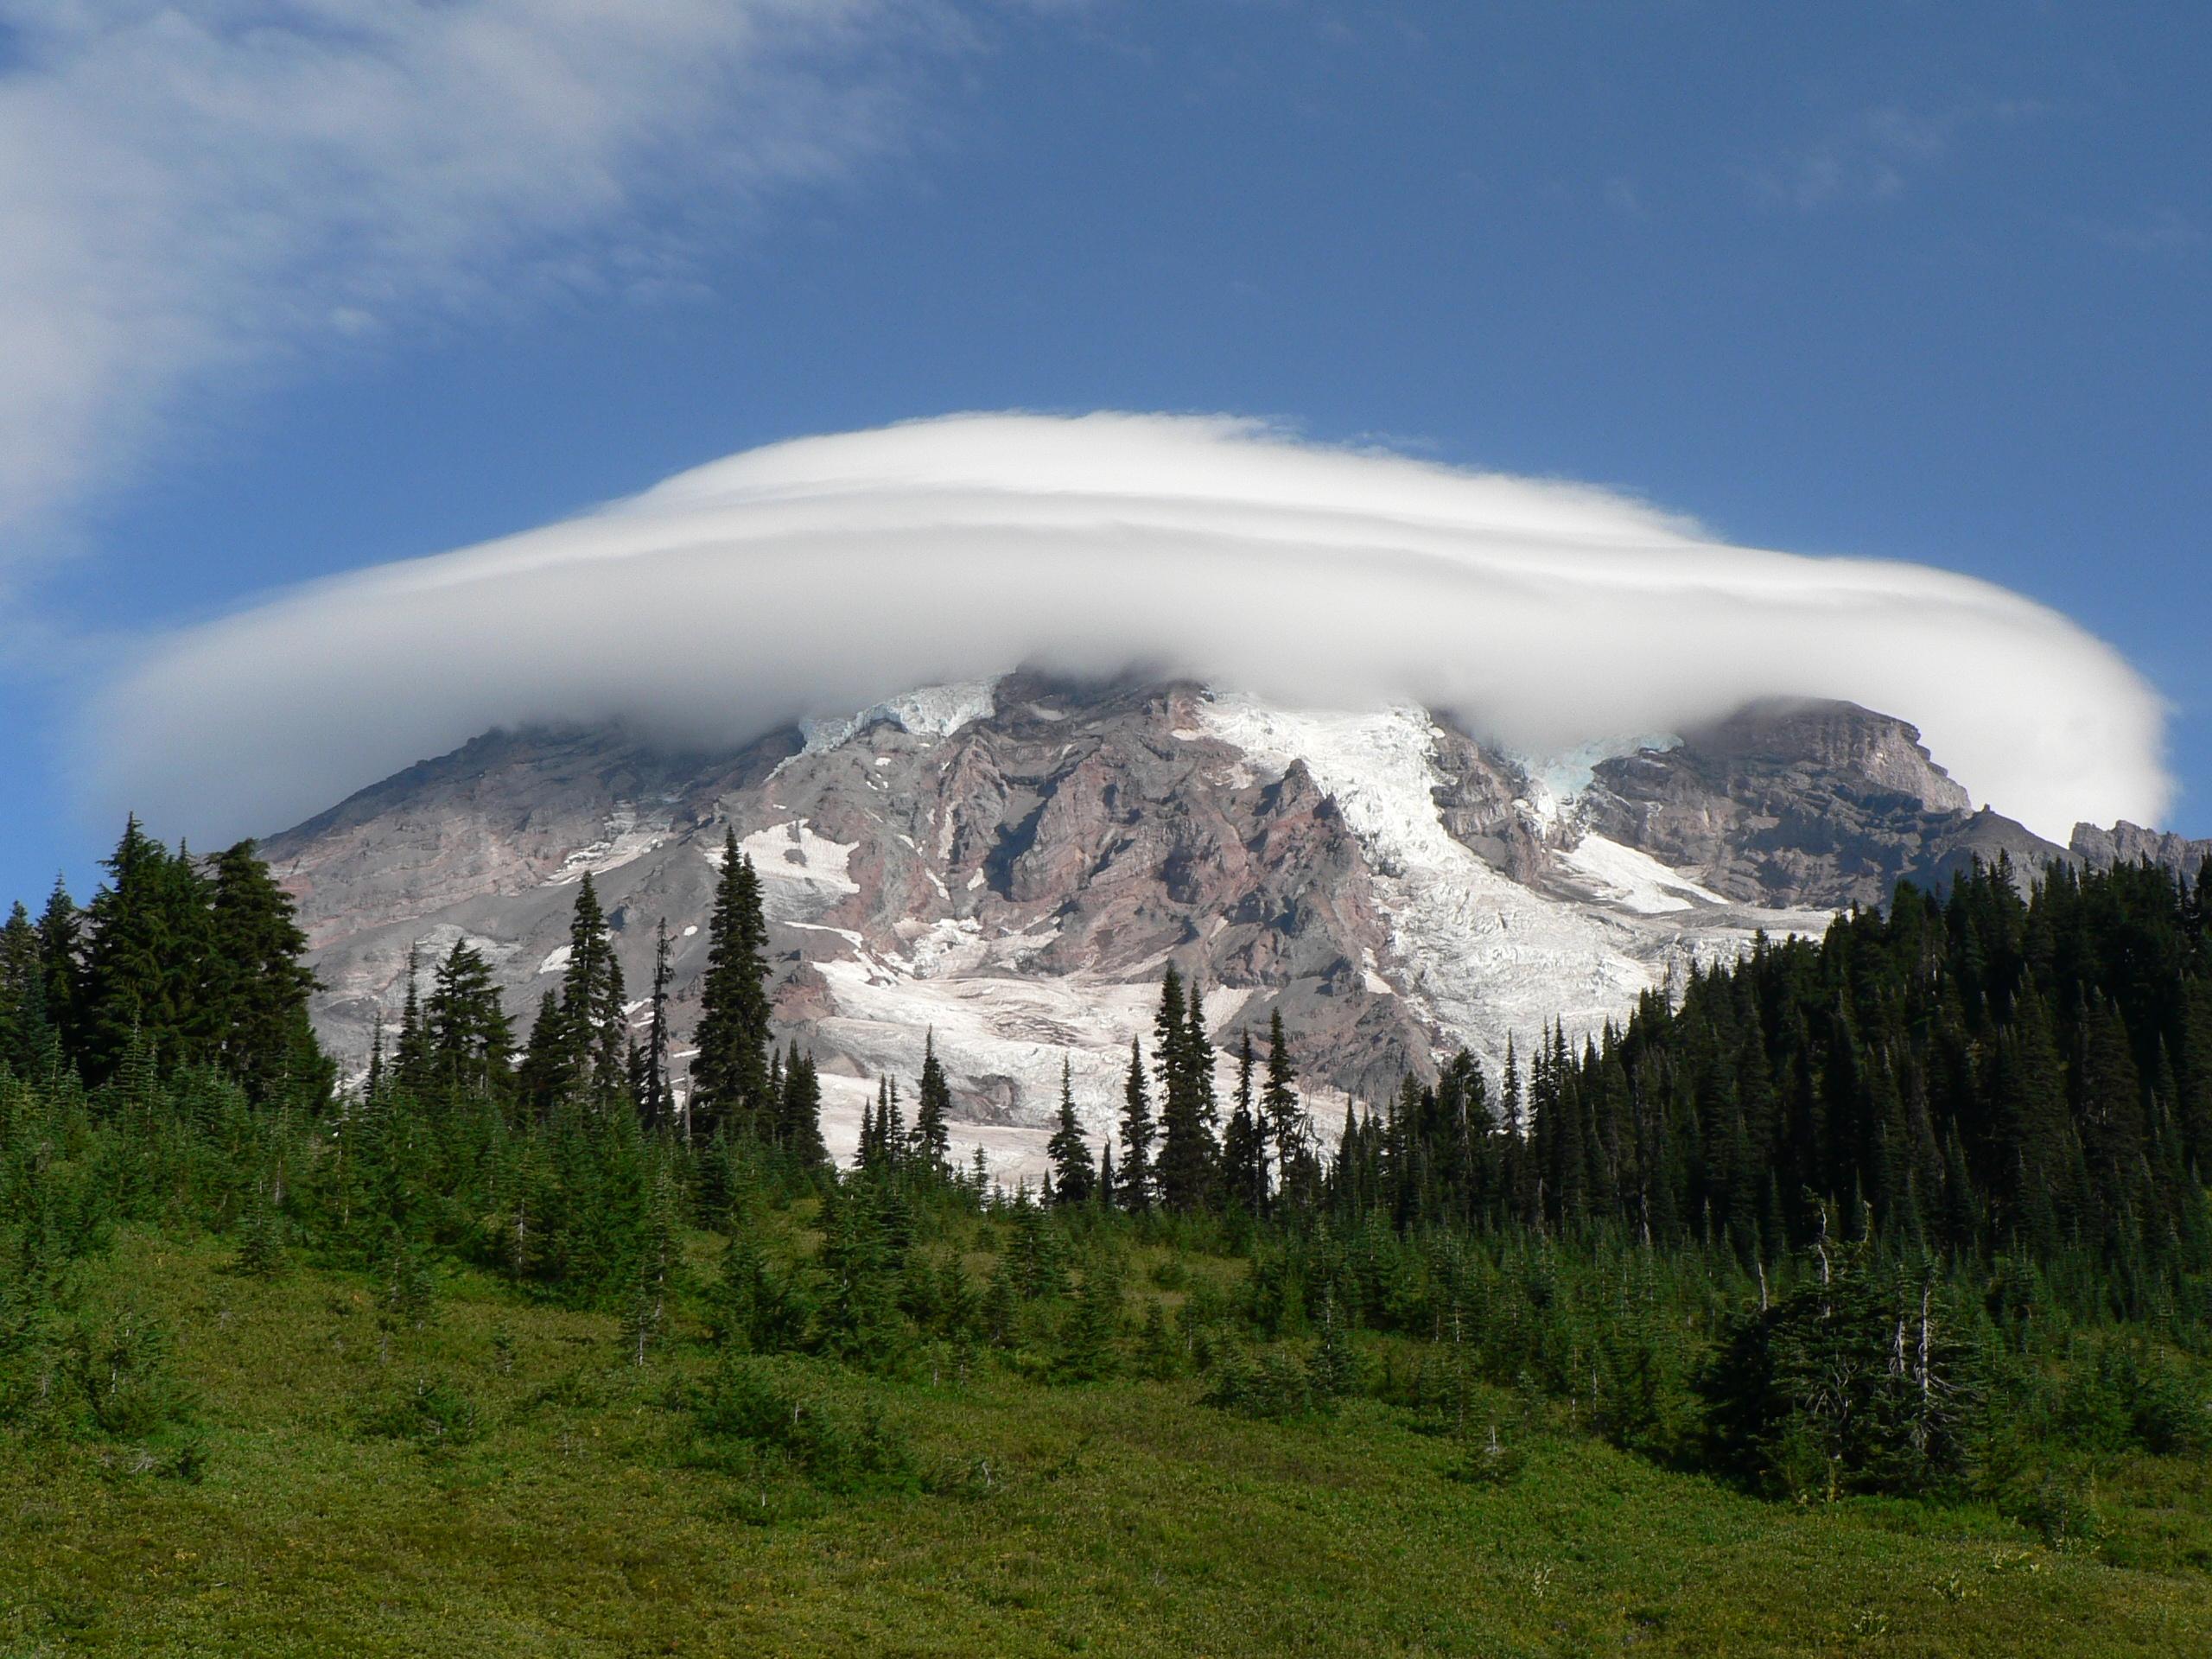 Mount Rainier National Park | MowryJournal.com